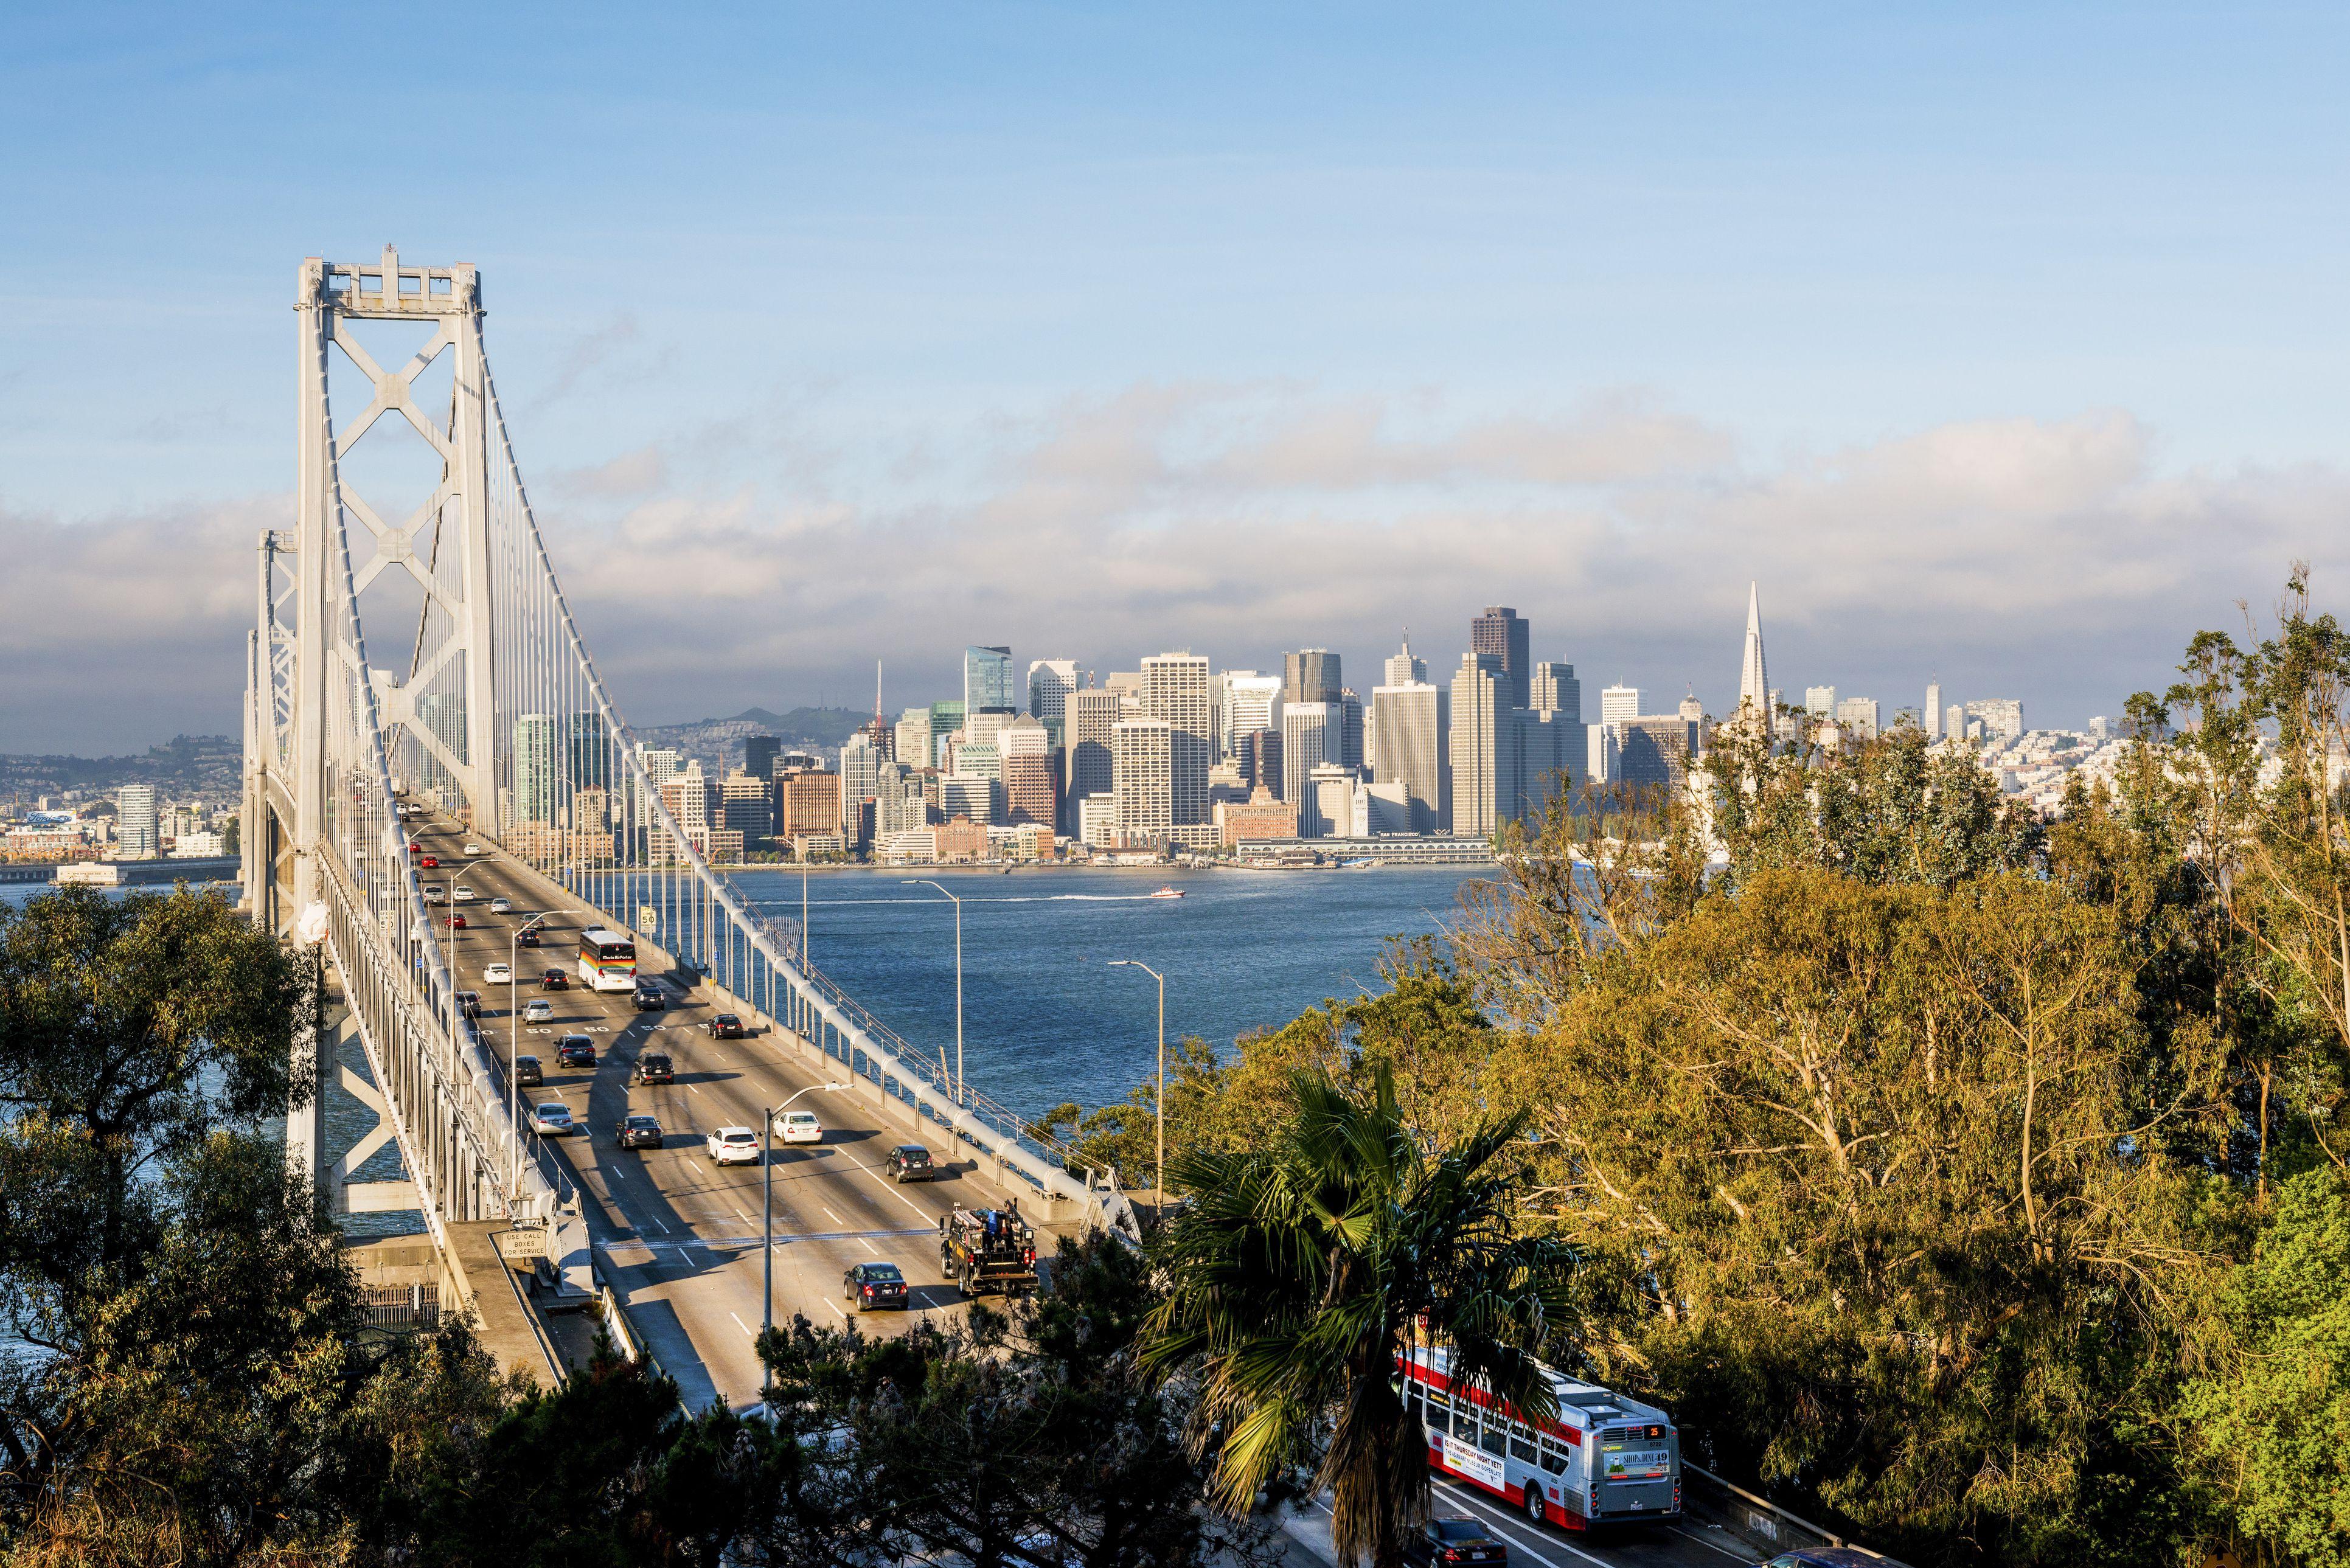 USA, California, San Francisco, Bay Bridge and city skyline